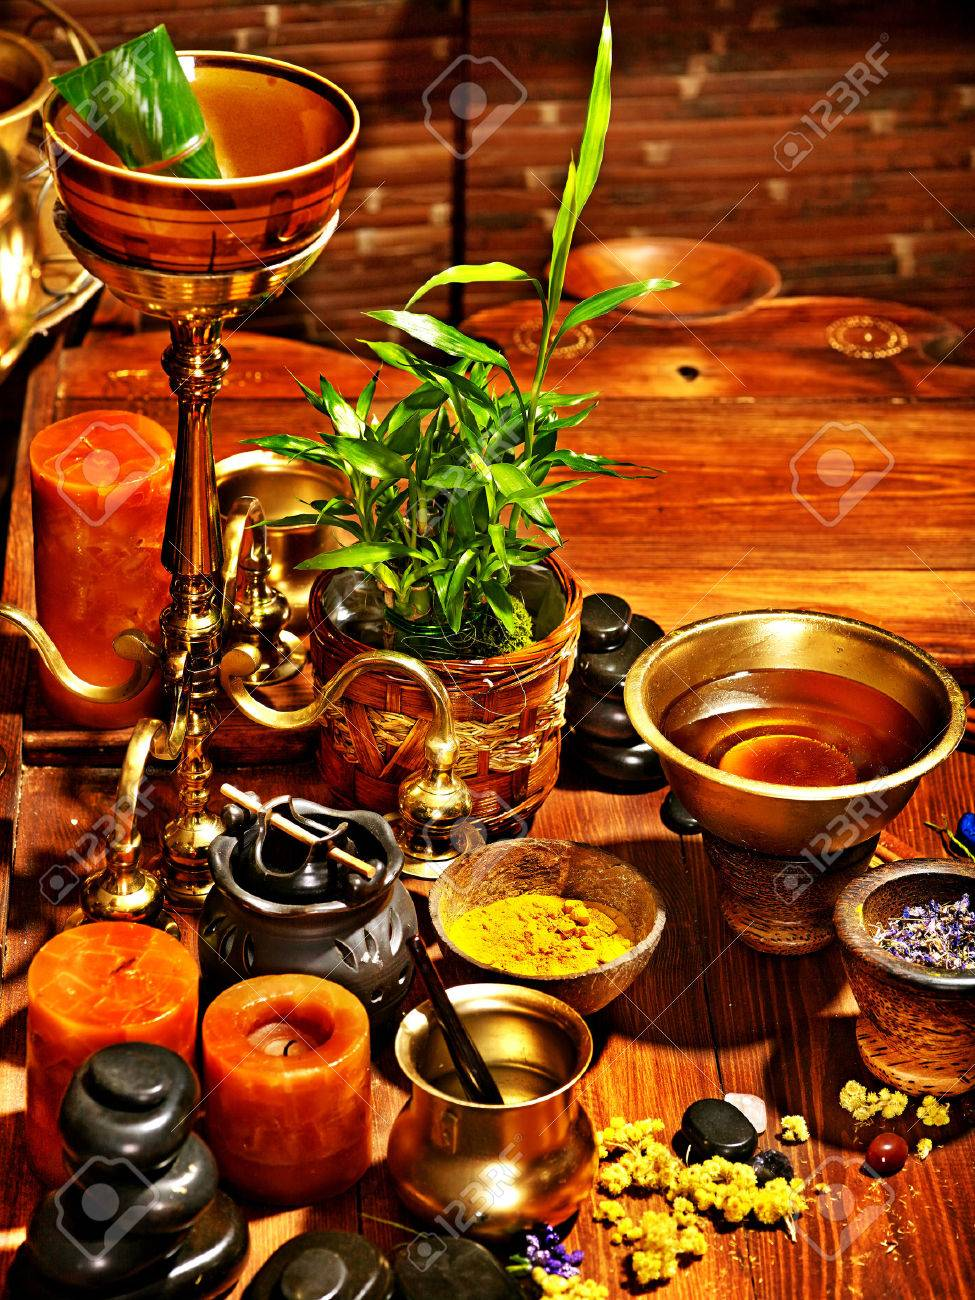 Luxury ayurvedic spa massage still life. - 28393925